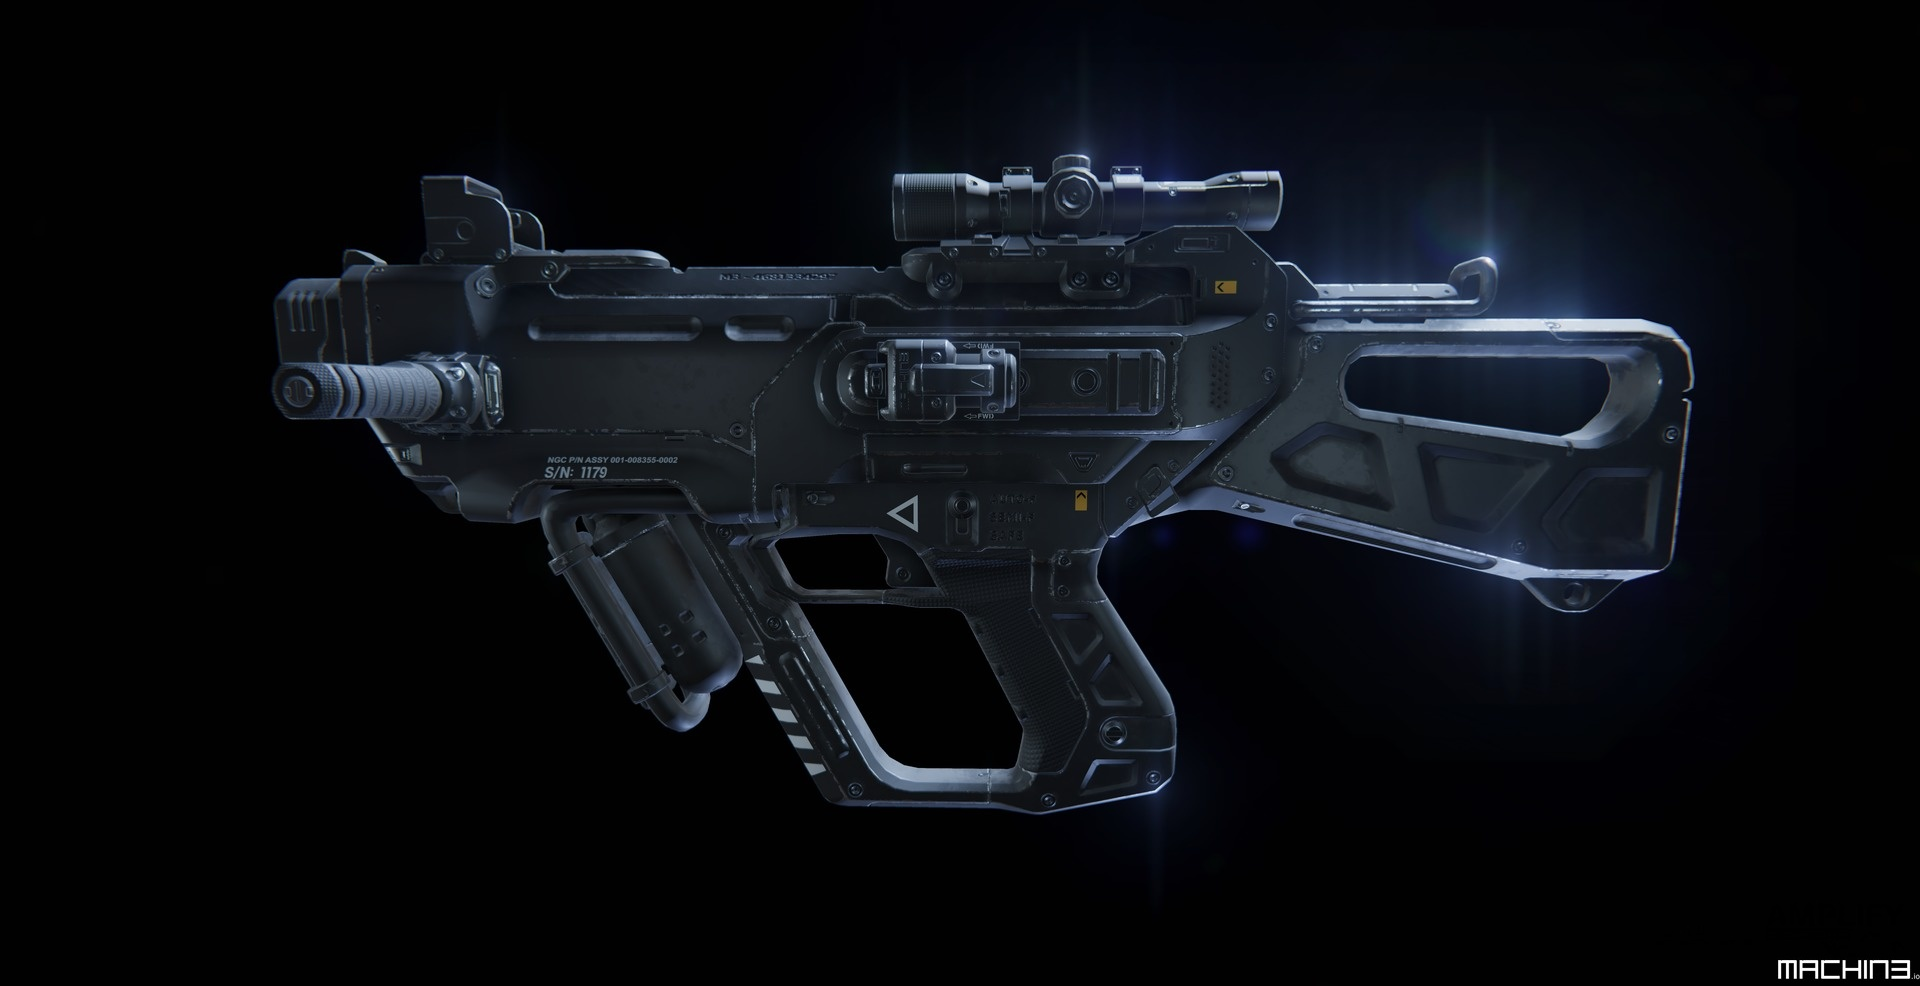 me-SMG SciFi Sub Machine Gun 3D Game Asset - MACHIN3 io